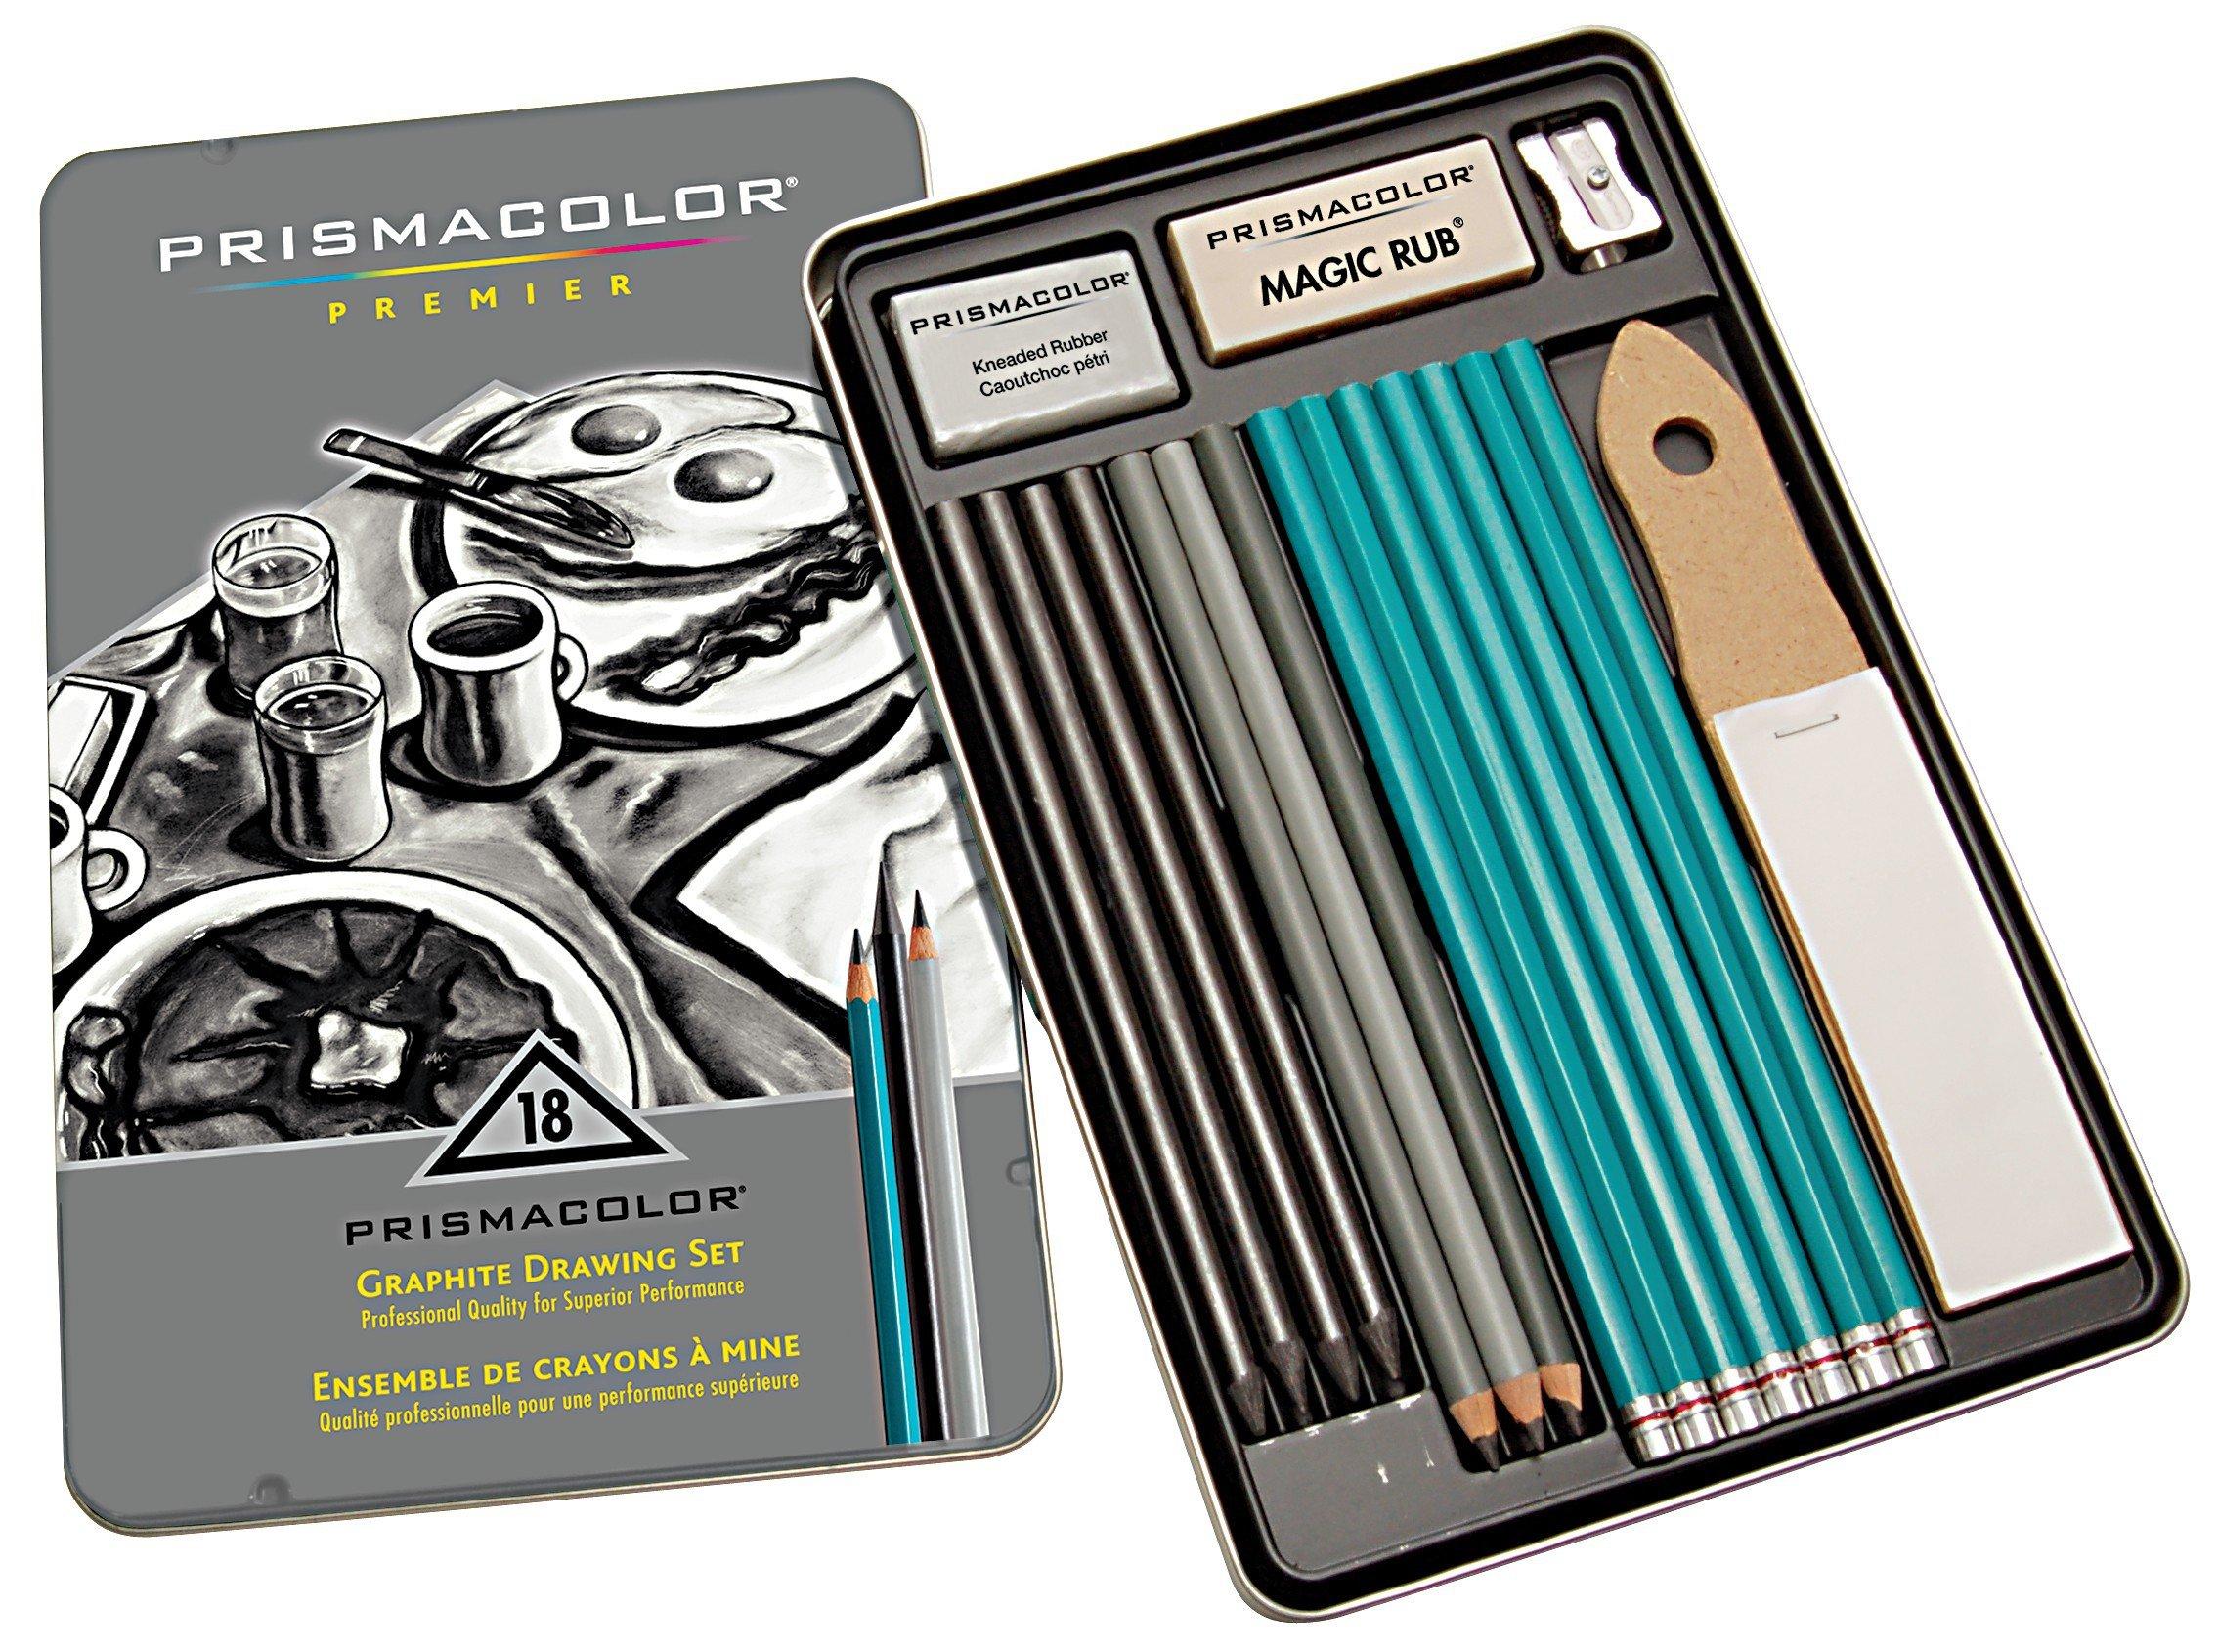 Prismacolor 24261 Premier Graphite Drawing Pencils with Erasers & Sharpeners, 18-Piece Set by Prismacolor